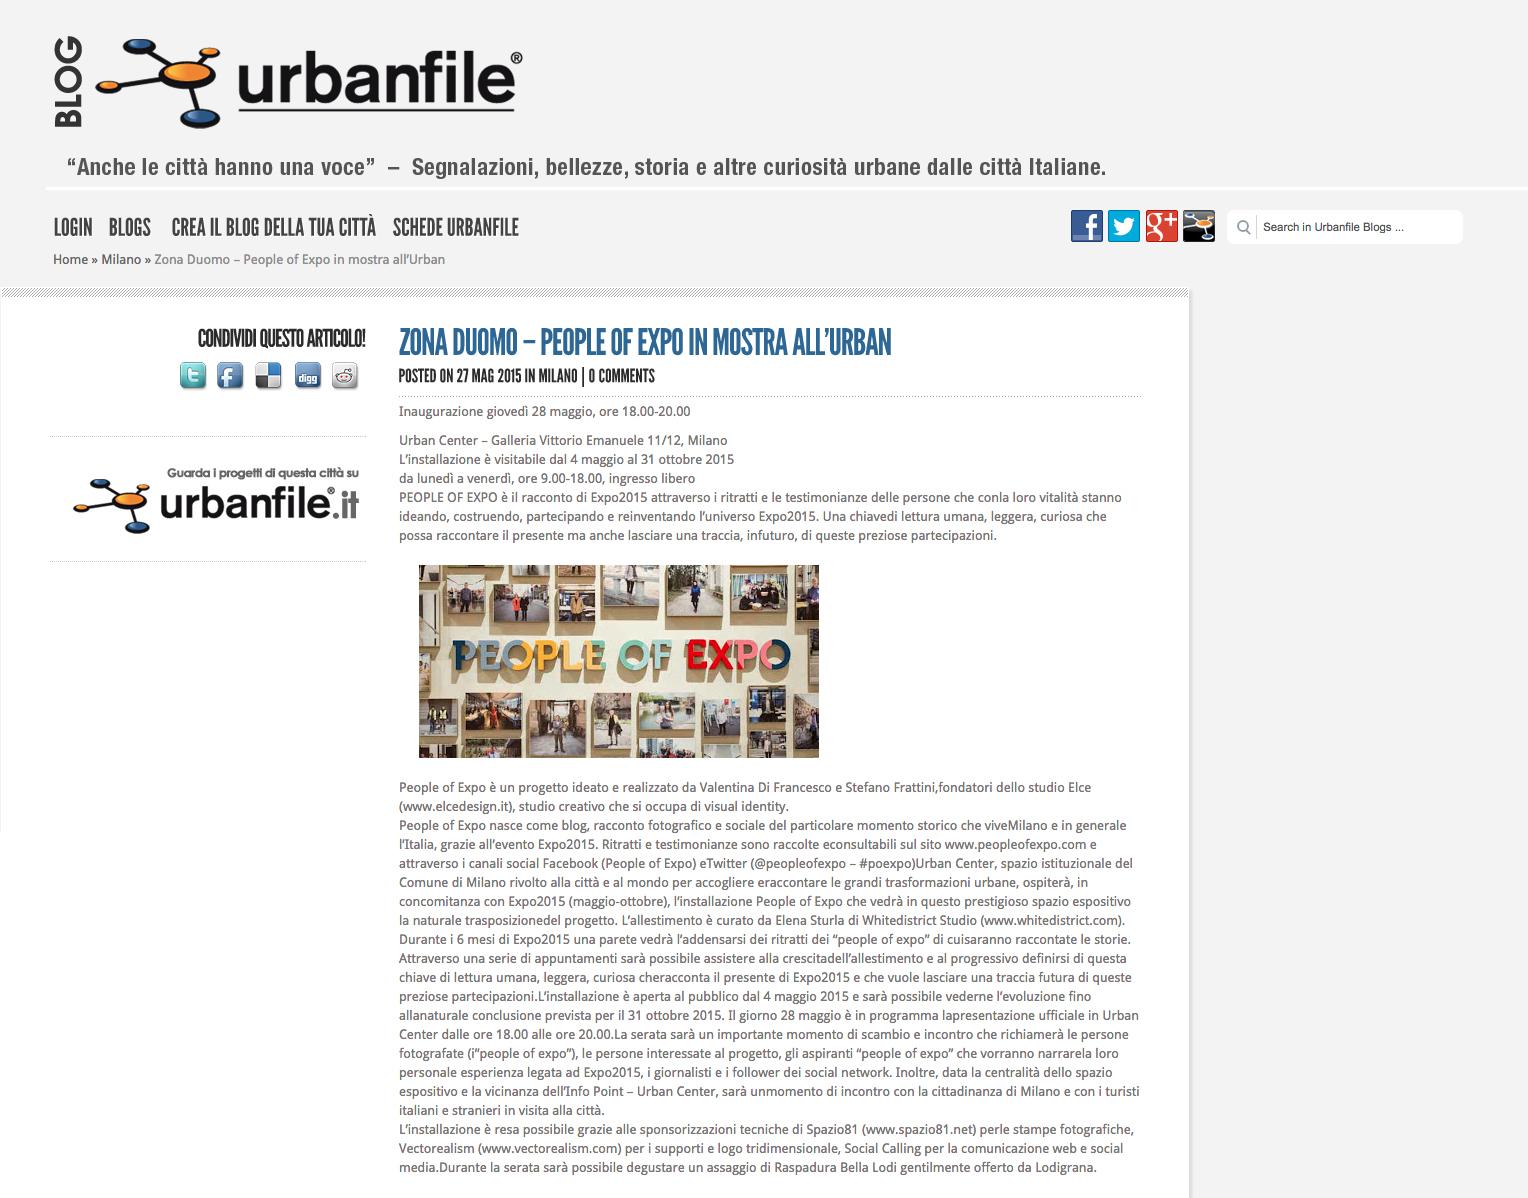 urbanfile